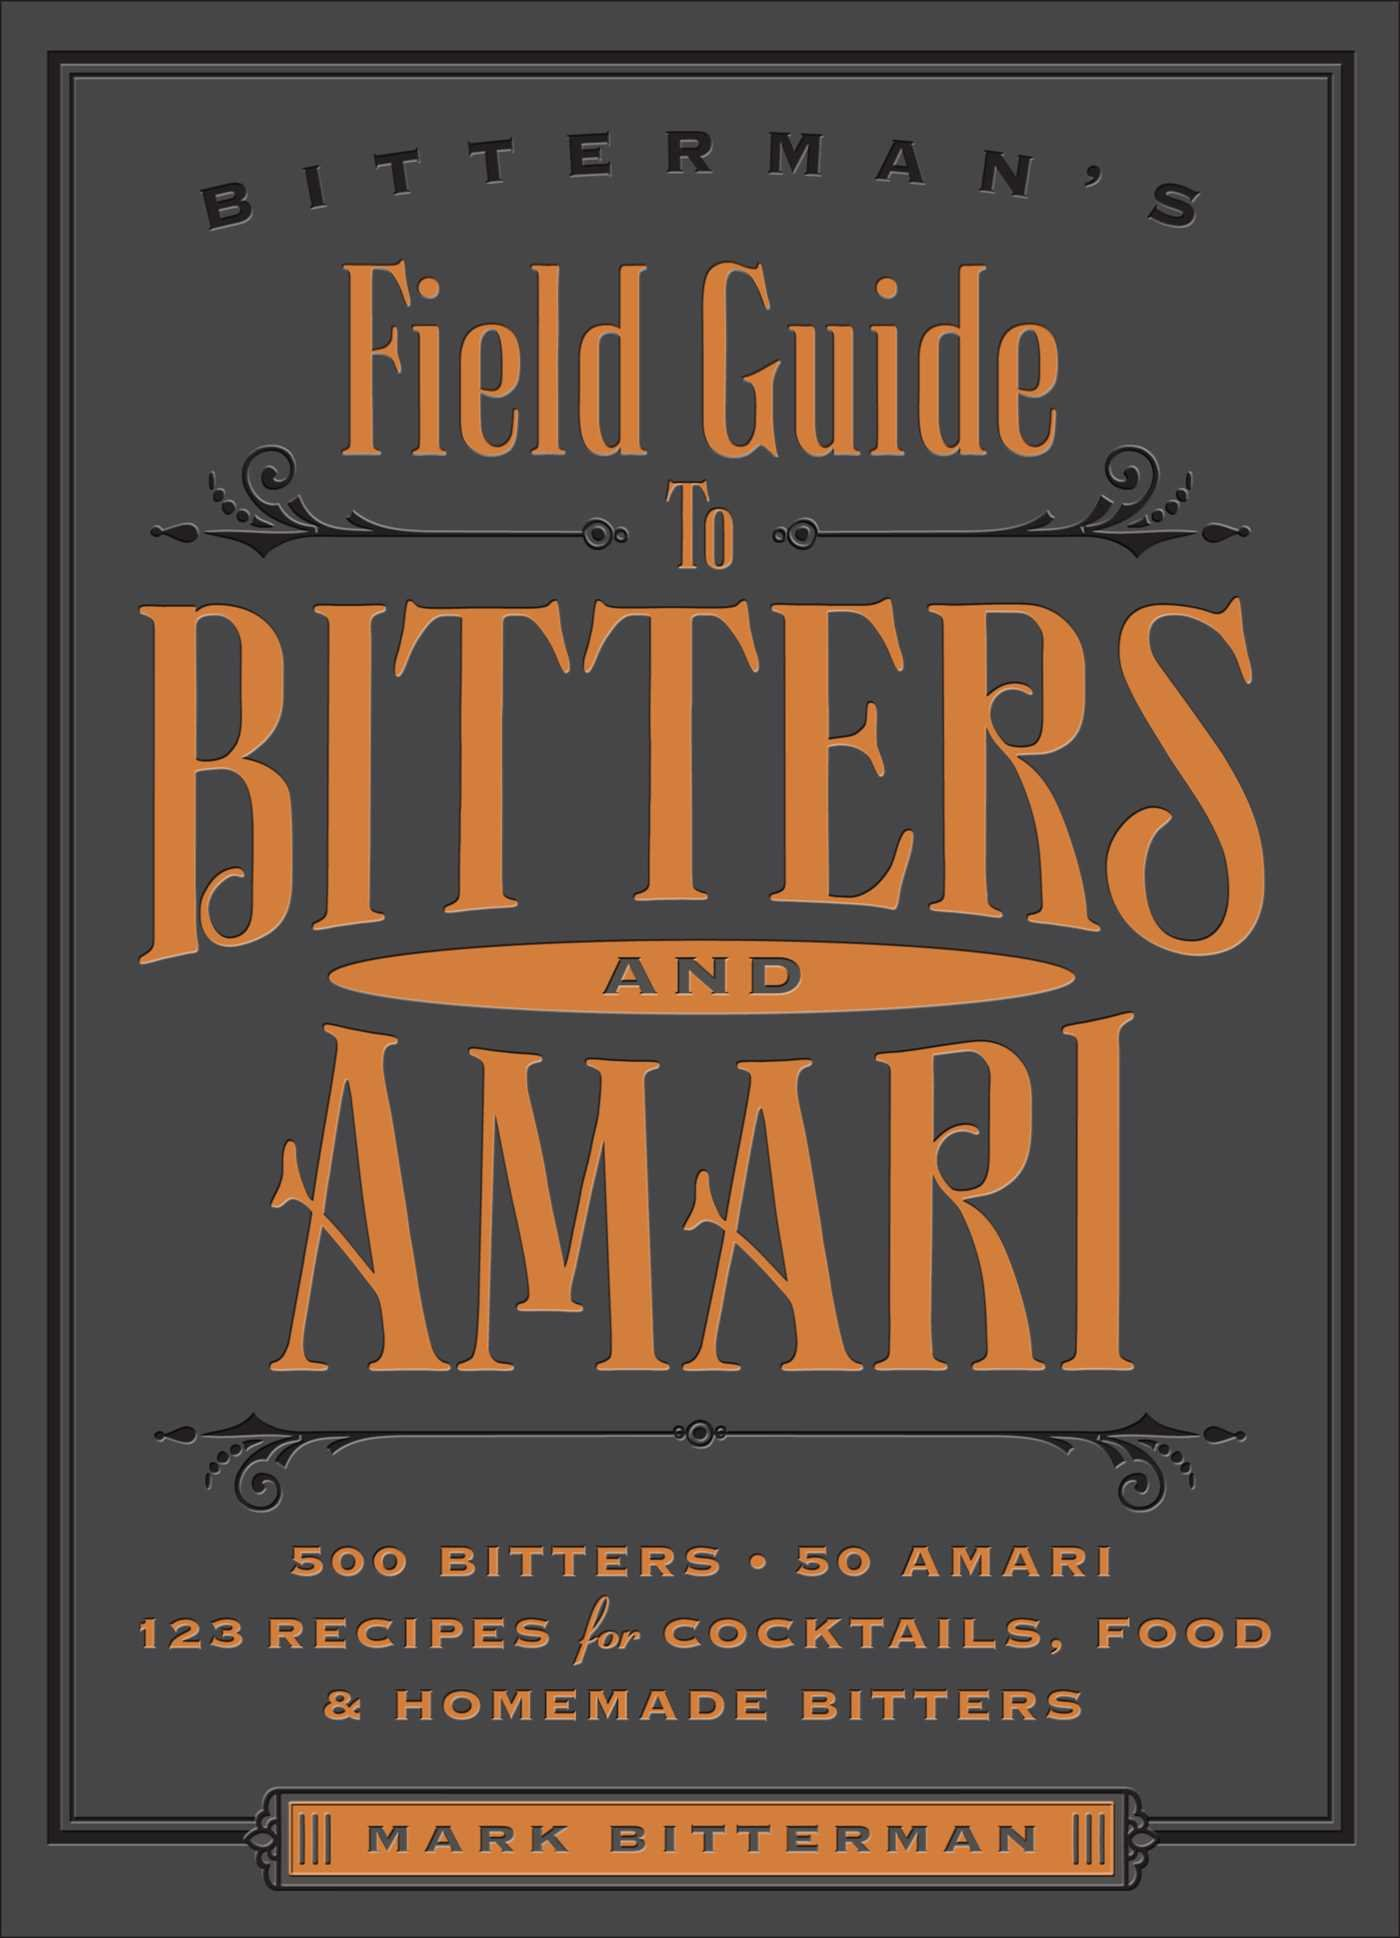 Bittermans Field Guide Bitters Amari product image